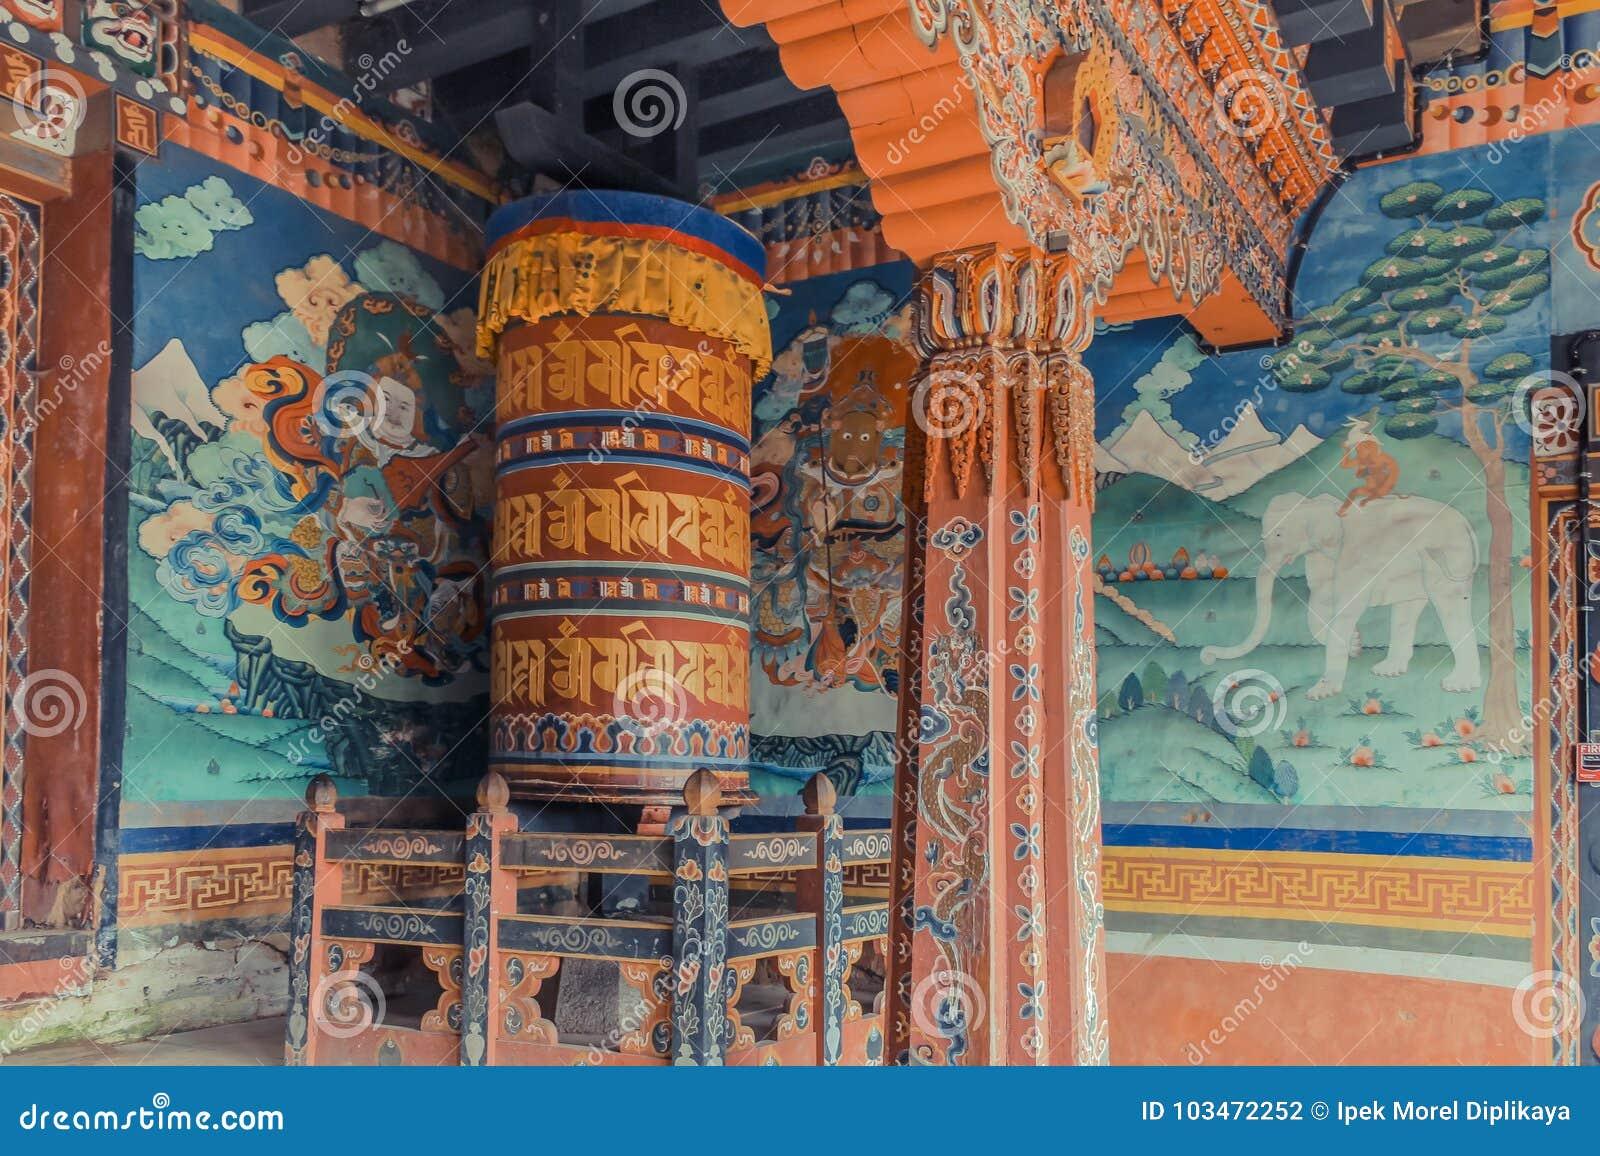 Trongsa, Bhután - 13 de septiembre de 2016: Pinturas de pared y rueda de rezo grande dentro del pórtico del Trongsa Dzong, Bhután